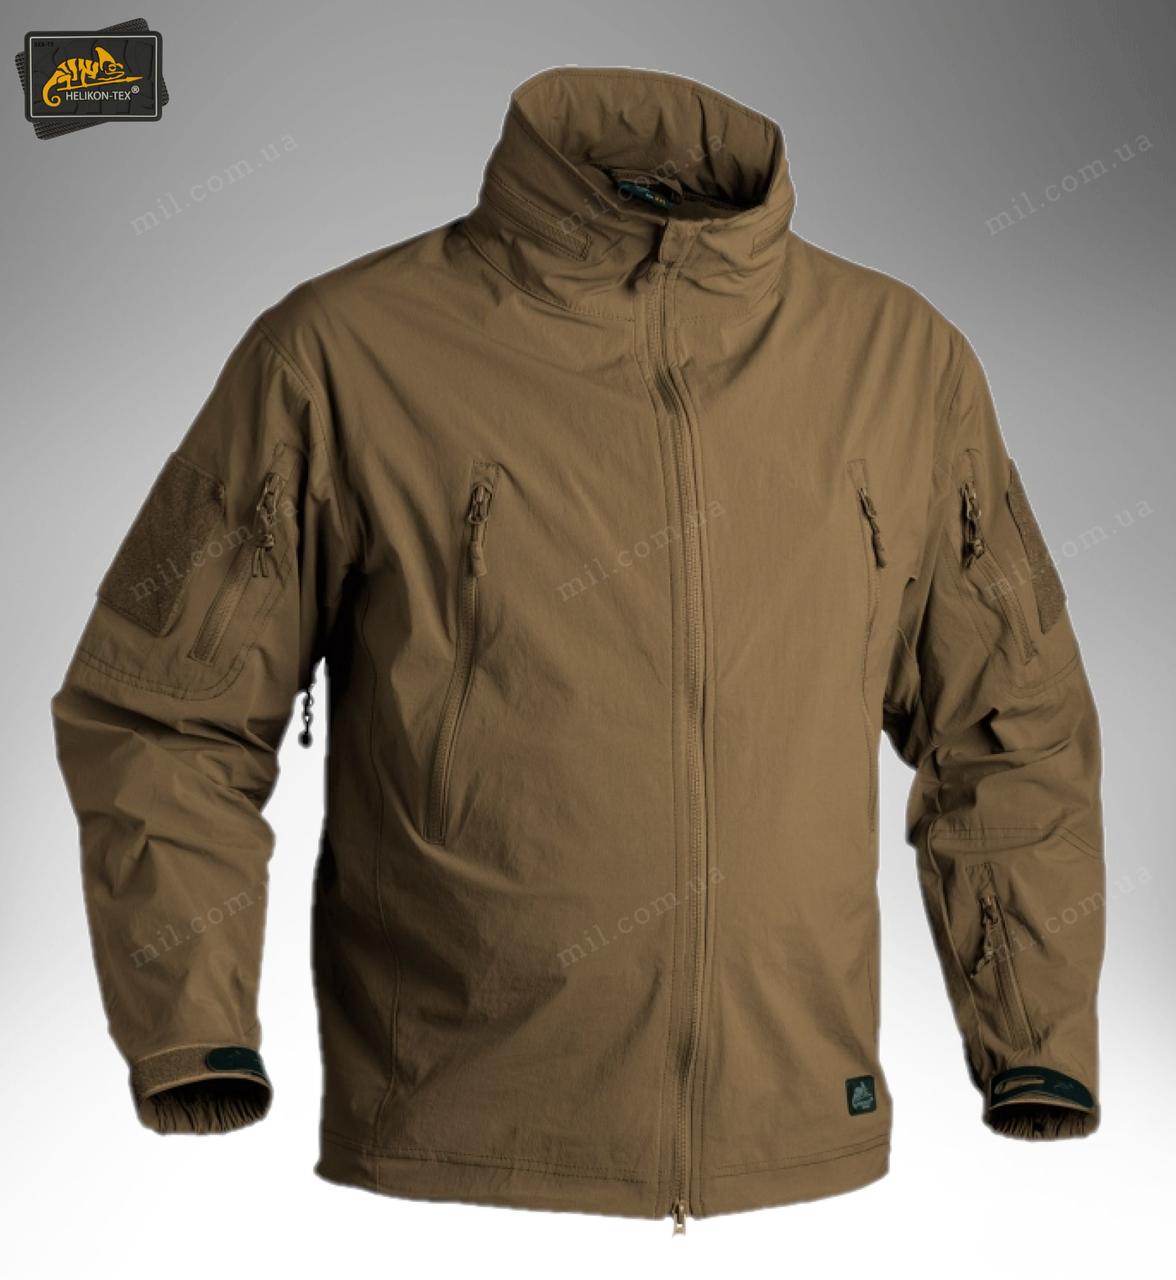 Демисезонная тактическая куртка Helikon-Tex® TROOPER Soft Shell (coyote)